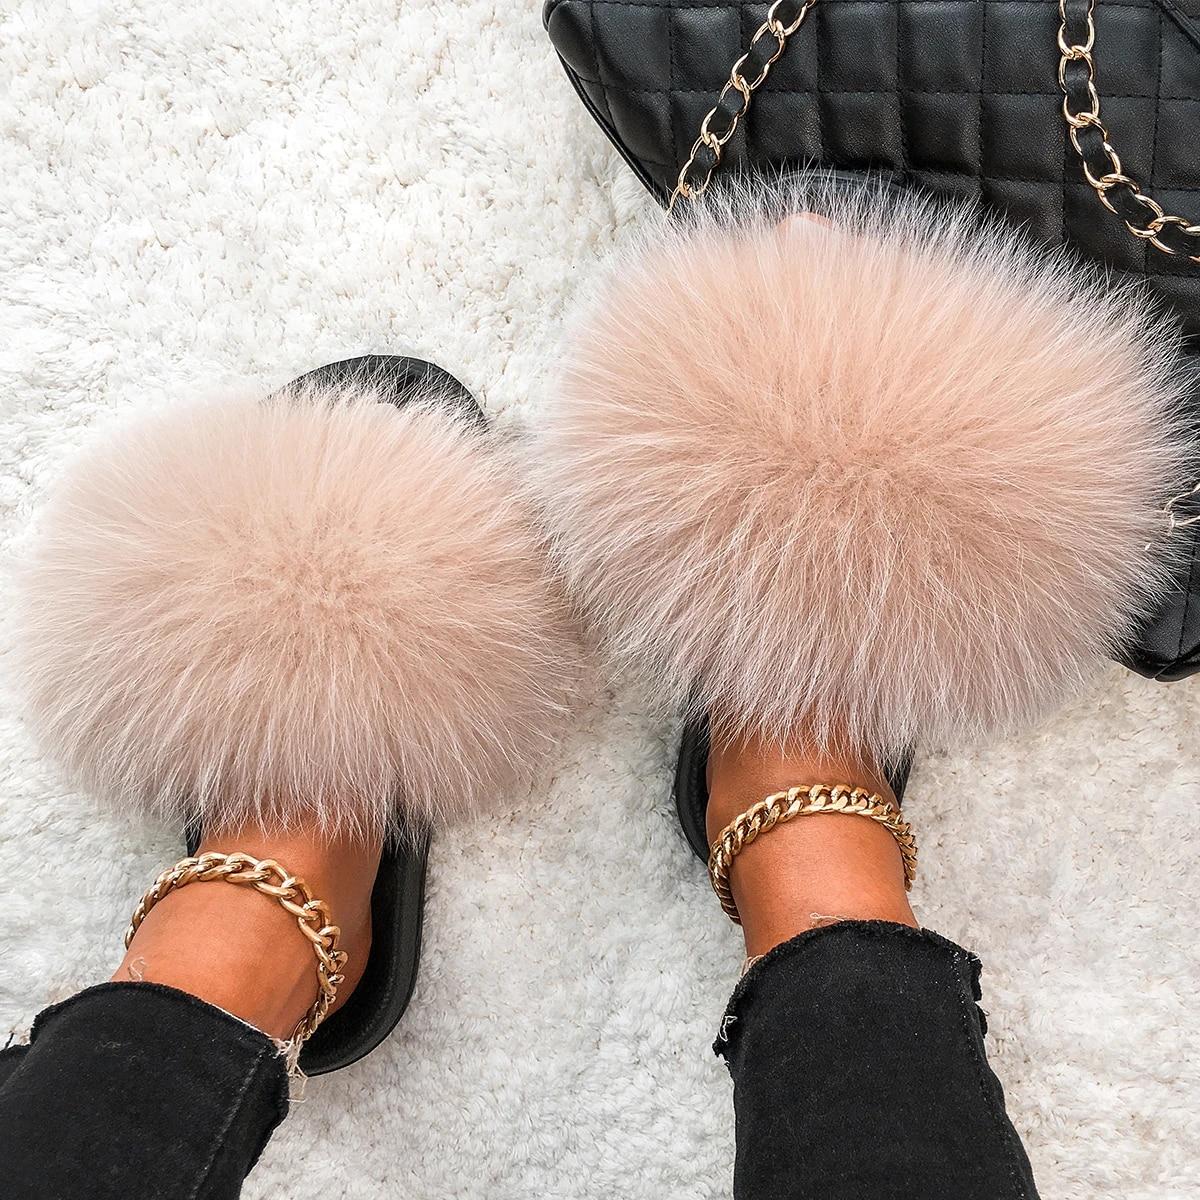 Raccoon Fur Slippers Plush Fox Fur Slides Flip Flops Sandals Cute Shoes,Yellow Fox Fur,7.5